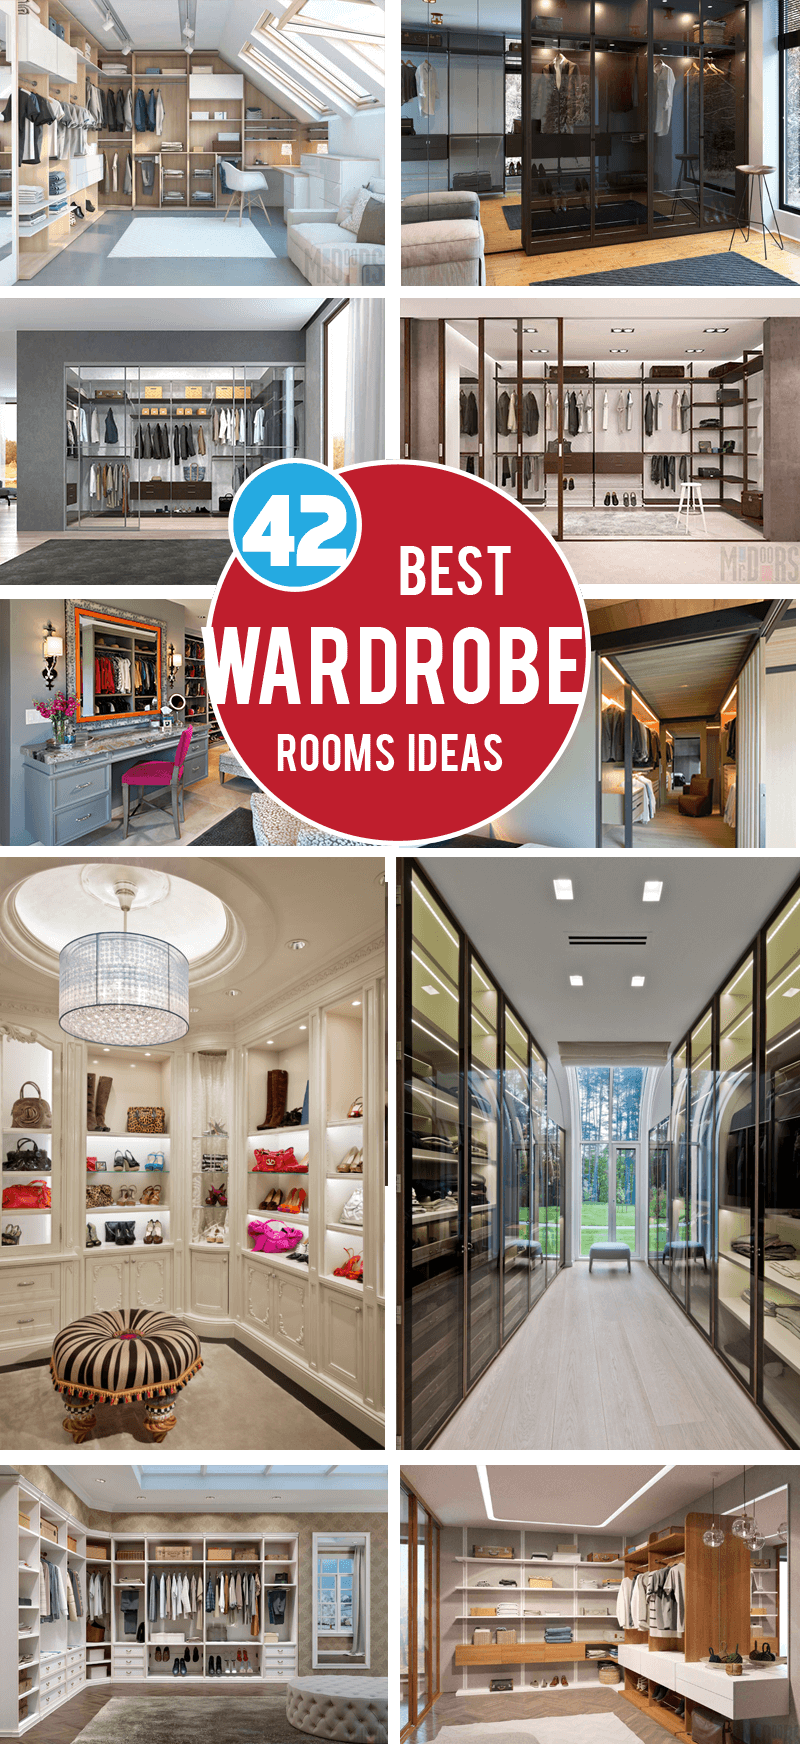 best wardrobe rooms ideas